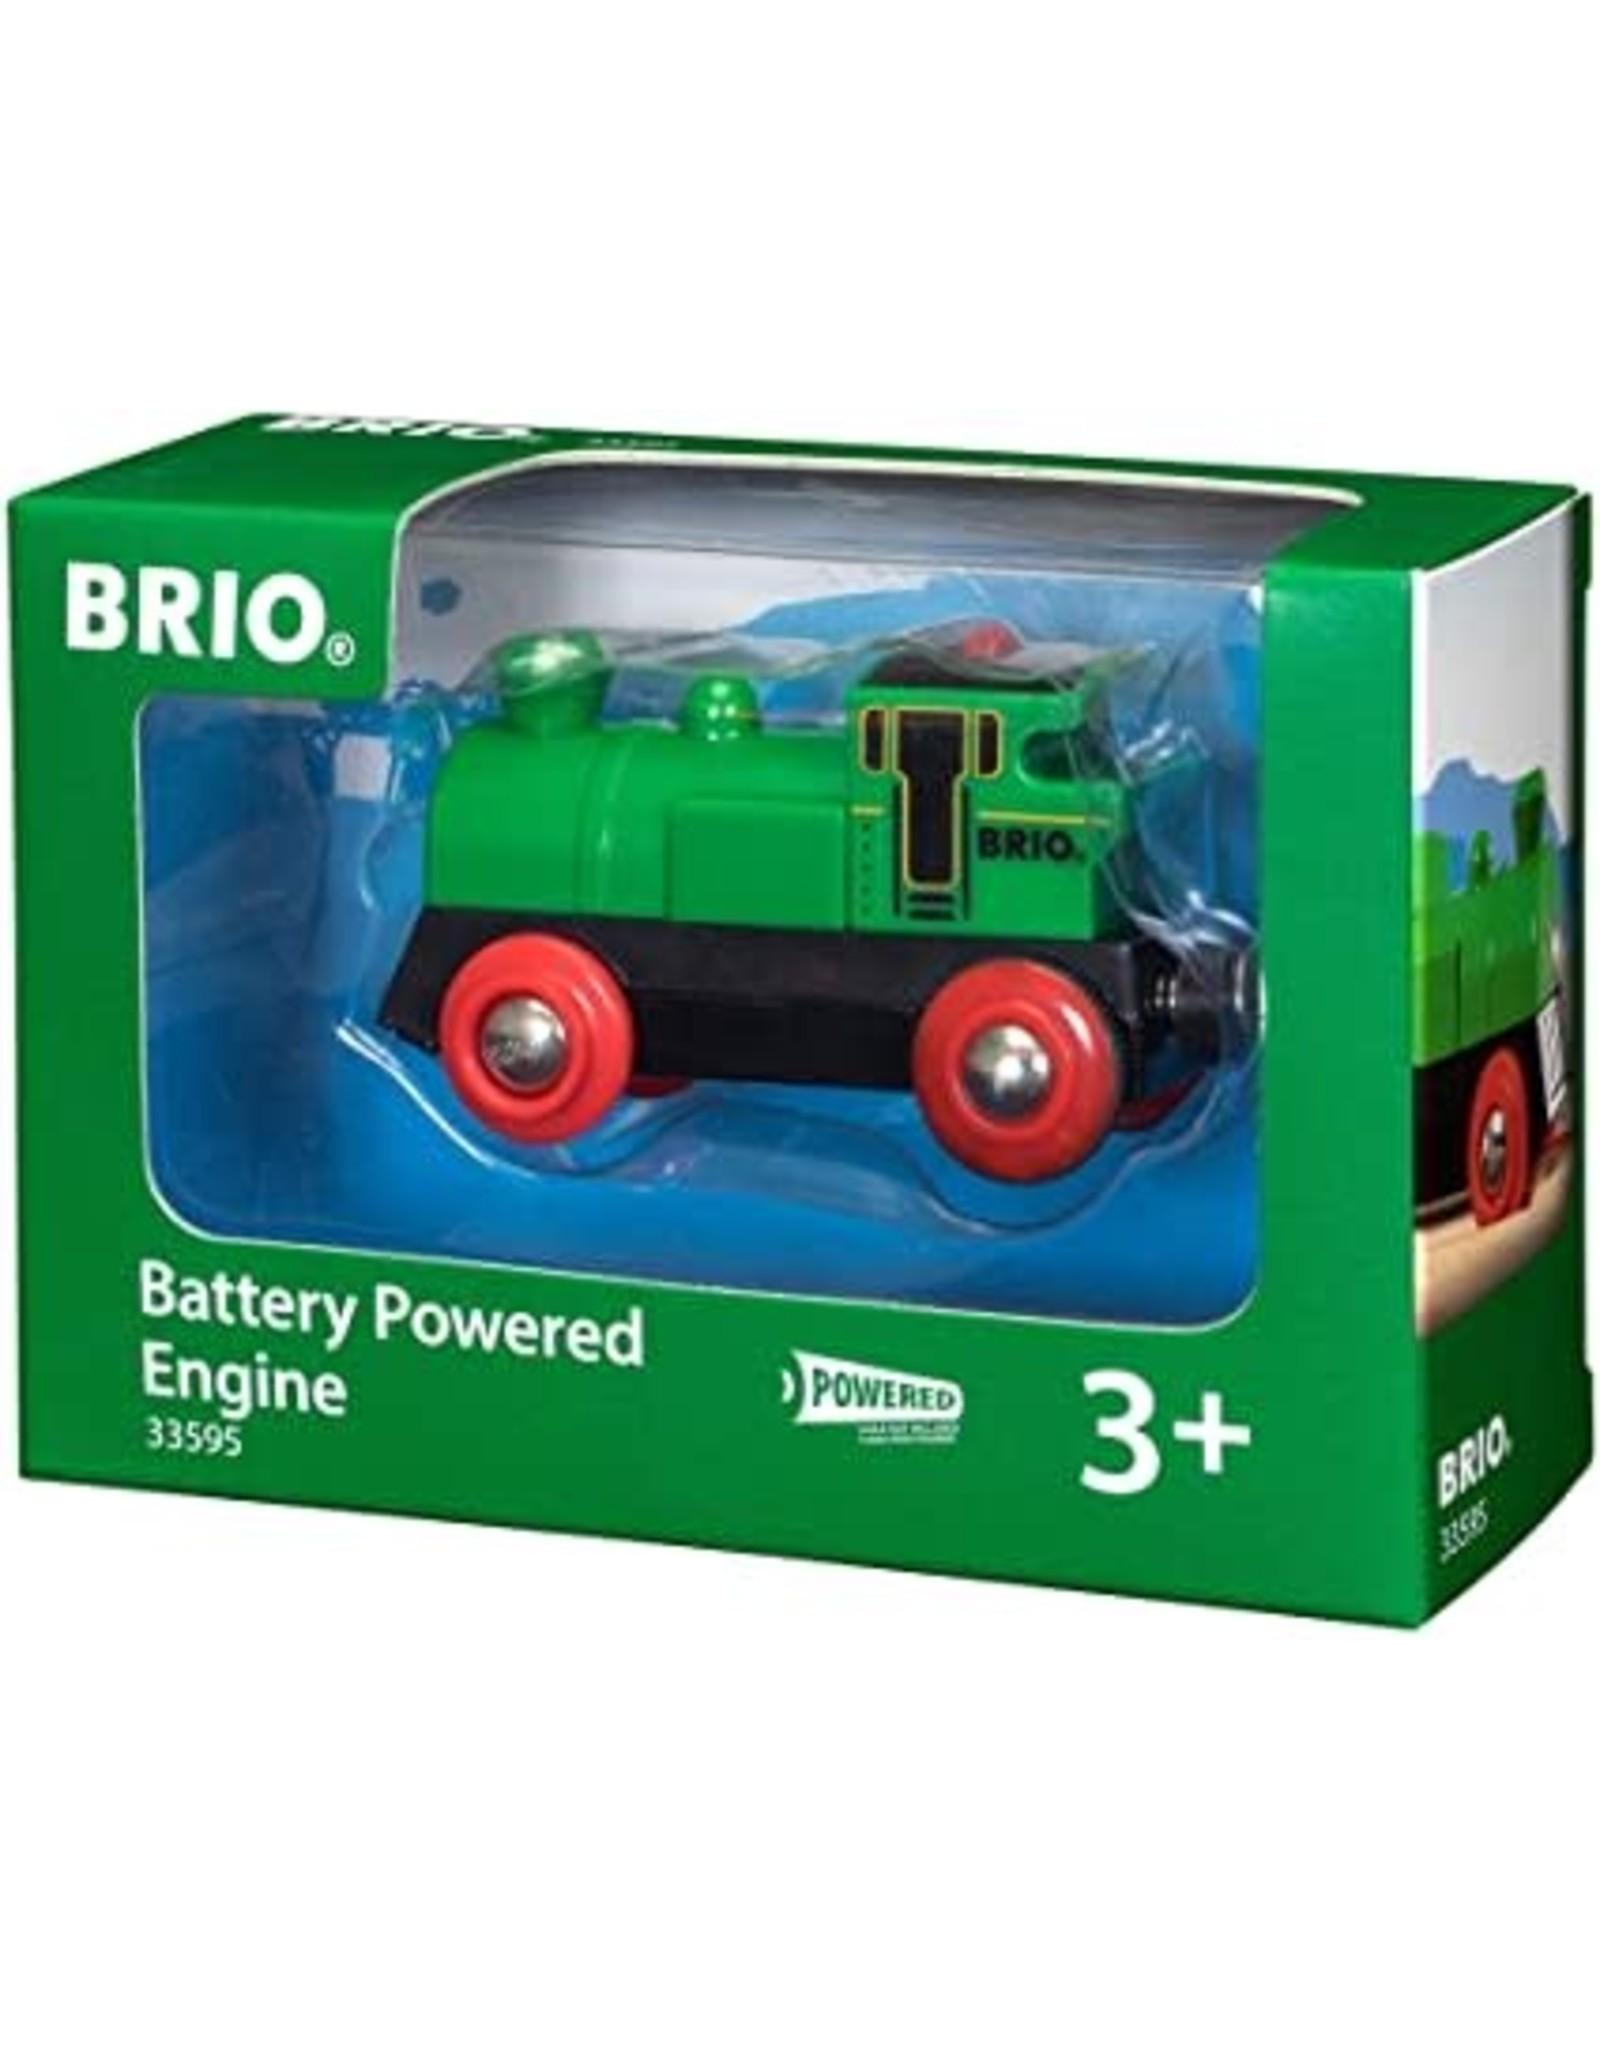 Brio BRIO Battery-Powered Engine